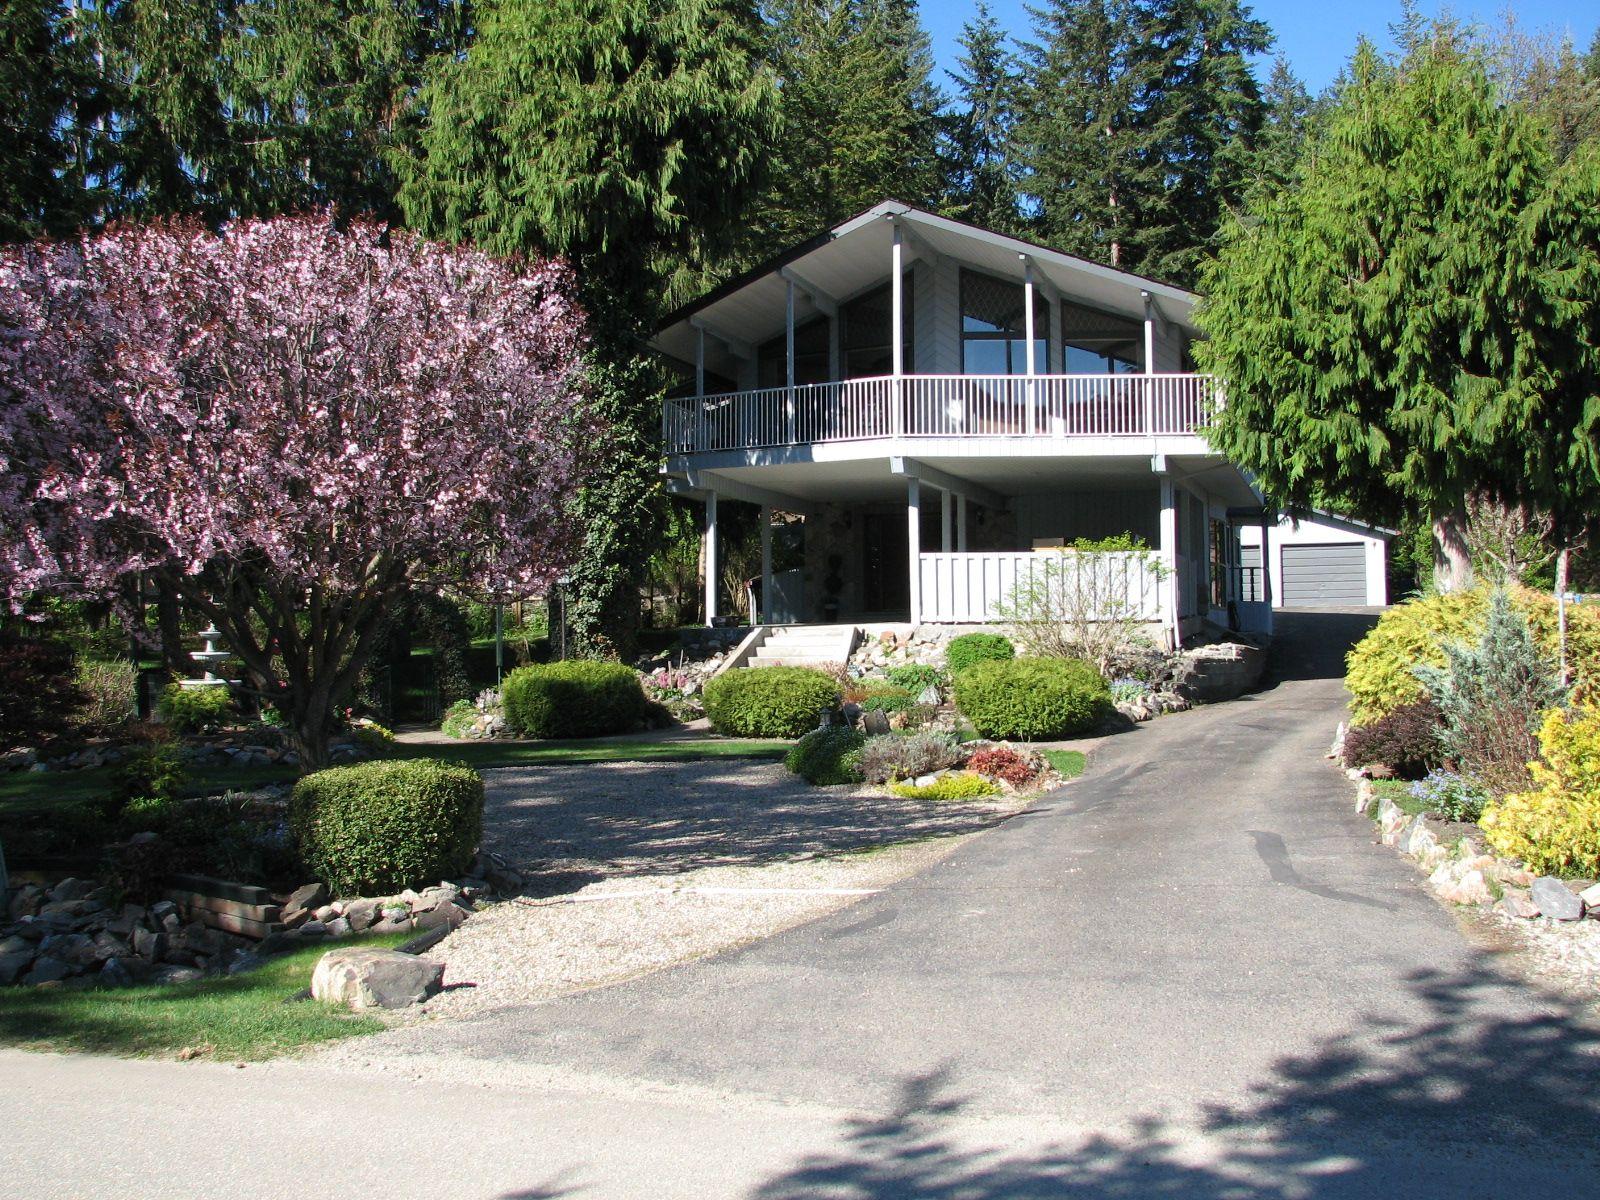 Main Photo: 2911 Juniper cres in Sorrento: Blind Bay House for sale (Shuswap)  : MLS®# 10230976